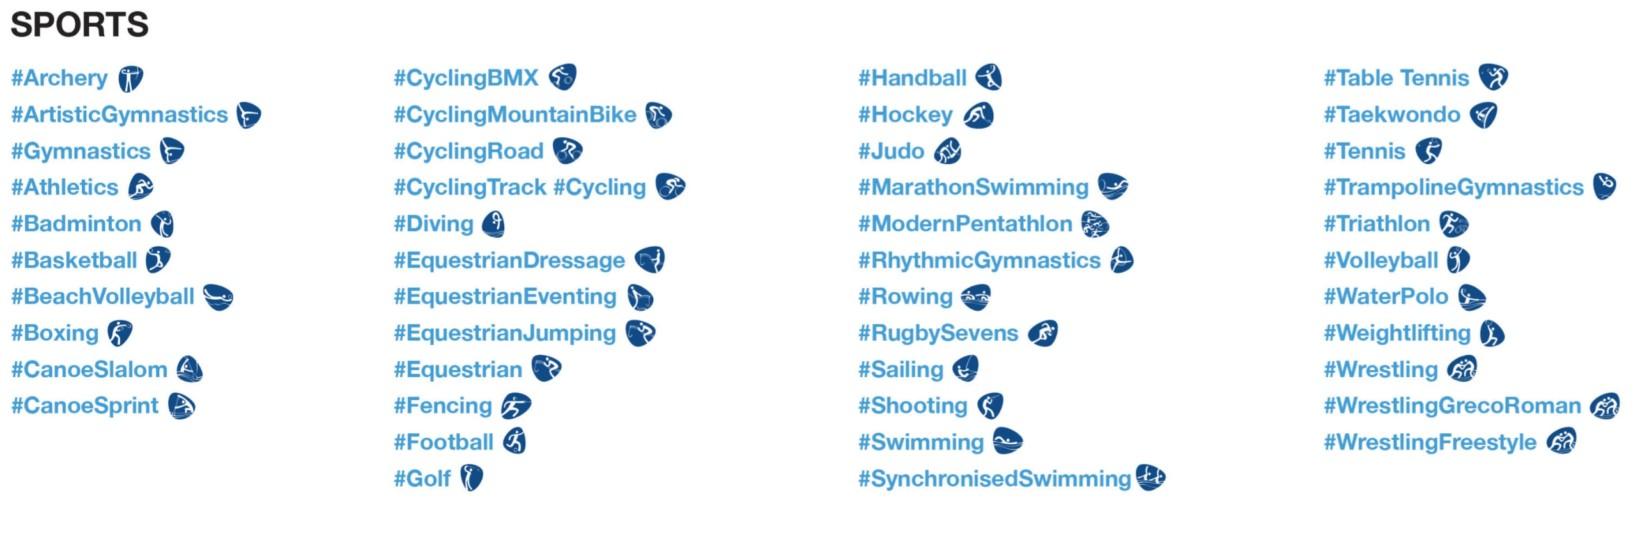 Use the relevant hashtag to invoke the emoji